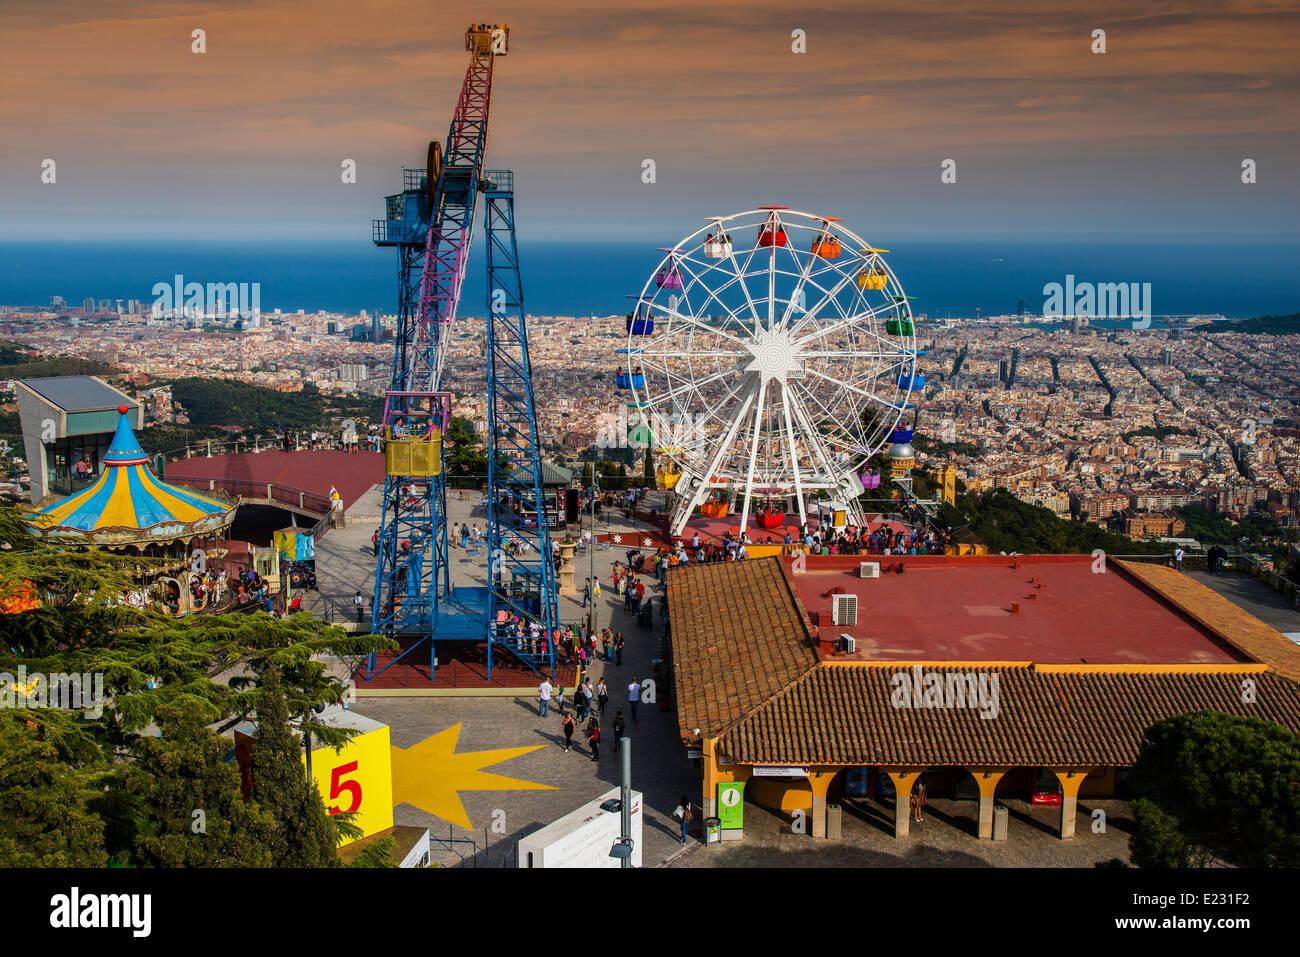 Tibidabo Amusement Park Barcelona Catalonia Spain Stock Photo Alamy